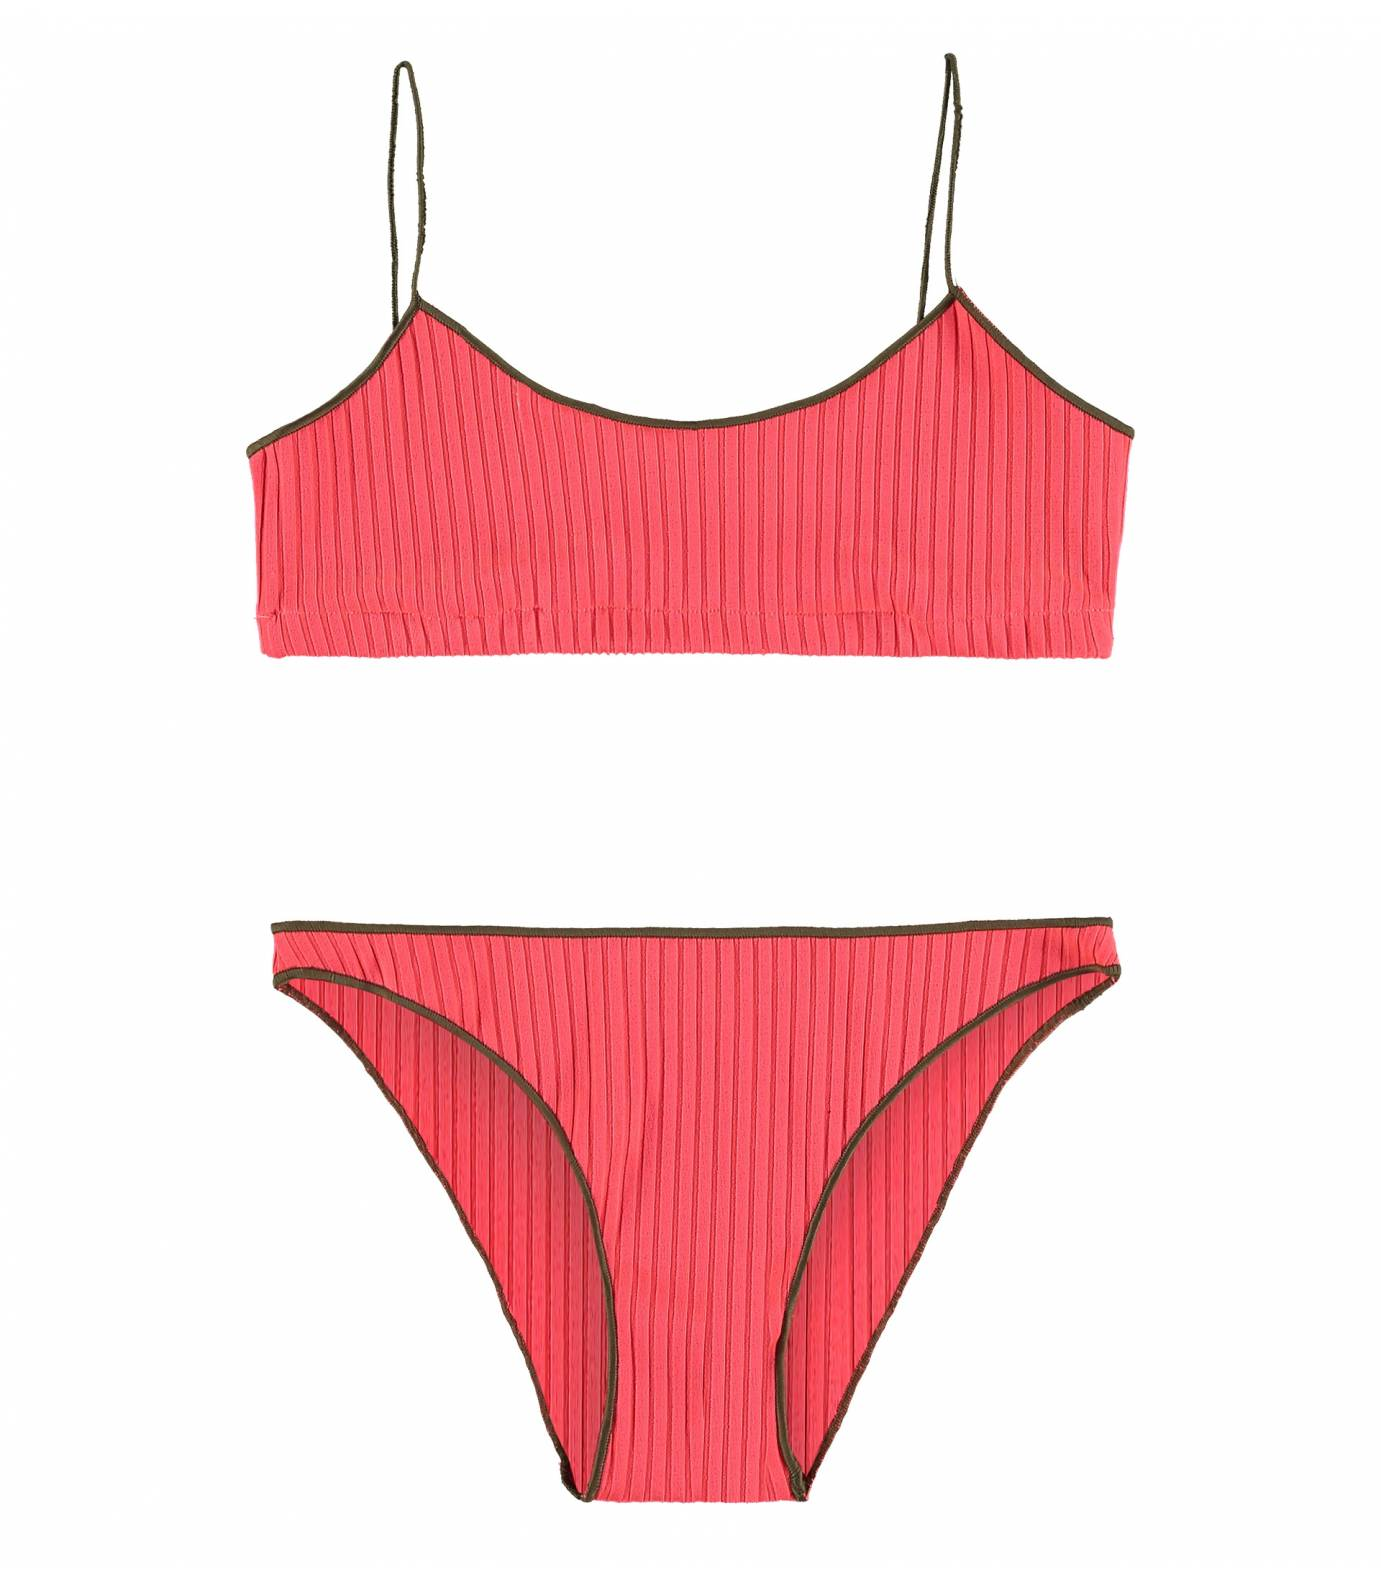 Bikini Canale Compac